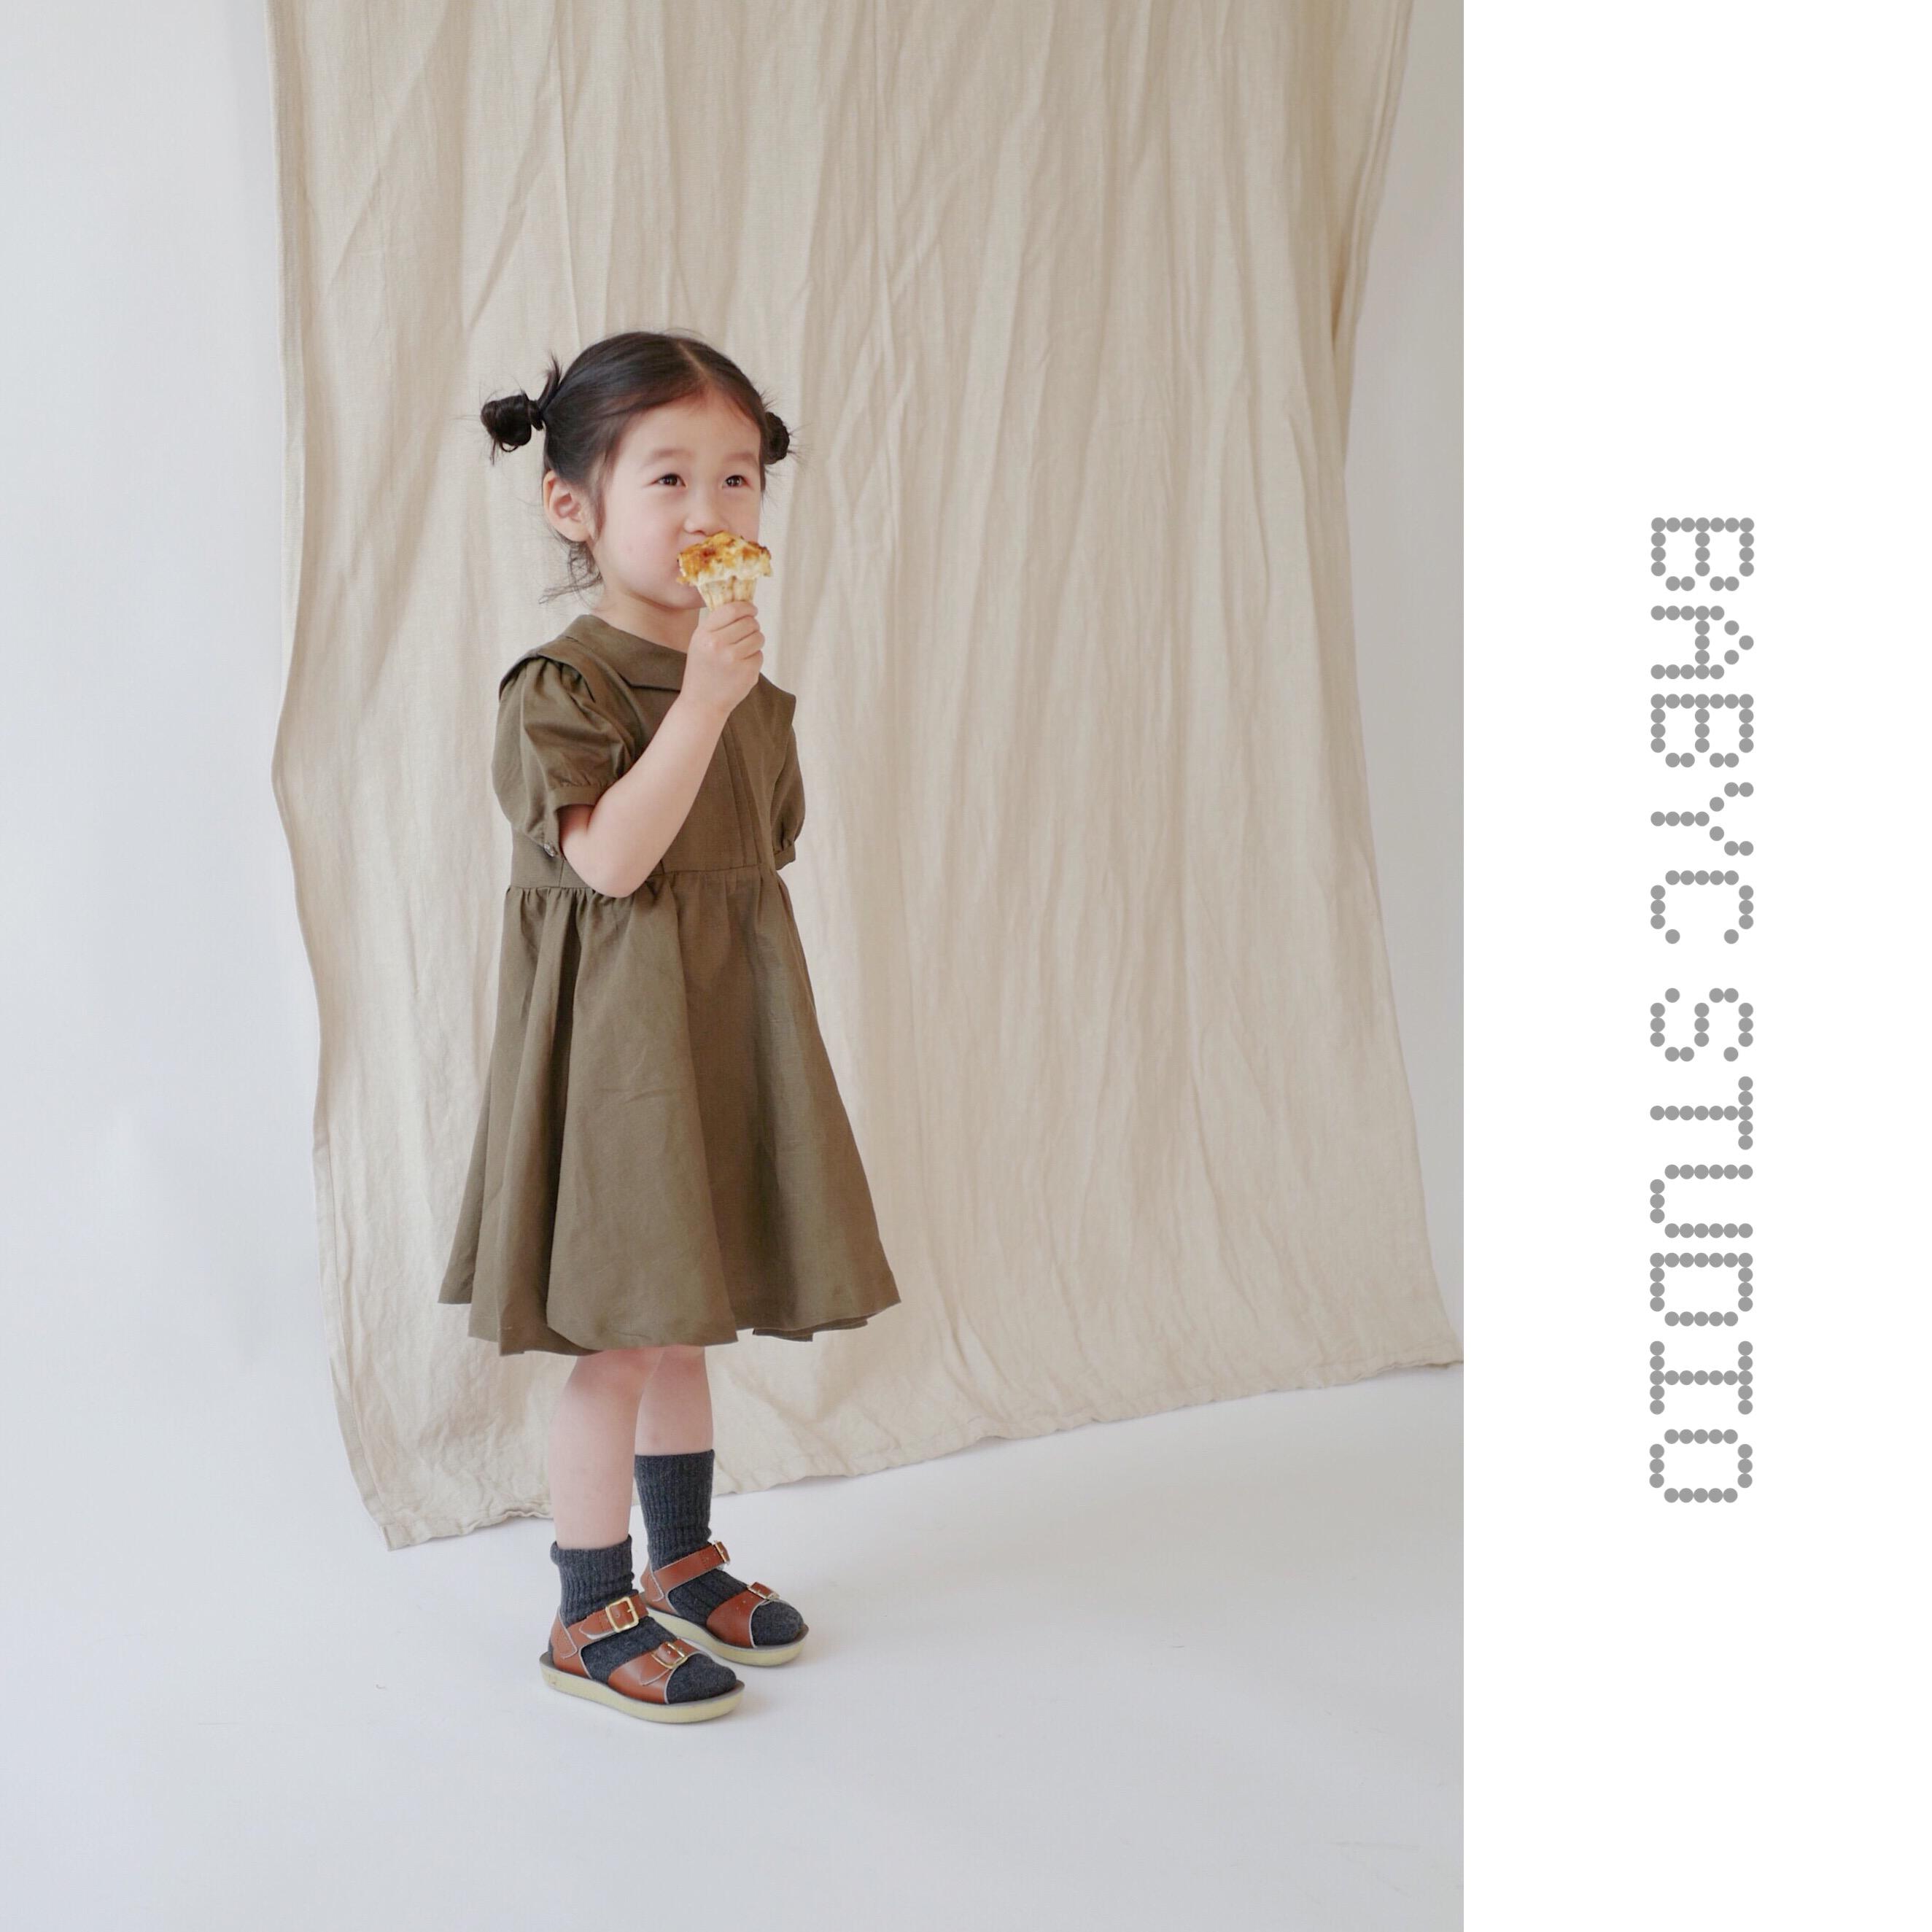 c妈自制女童夏装2018新款棉麻复古气质小众定制短袖连衣裙公主裙